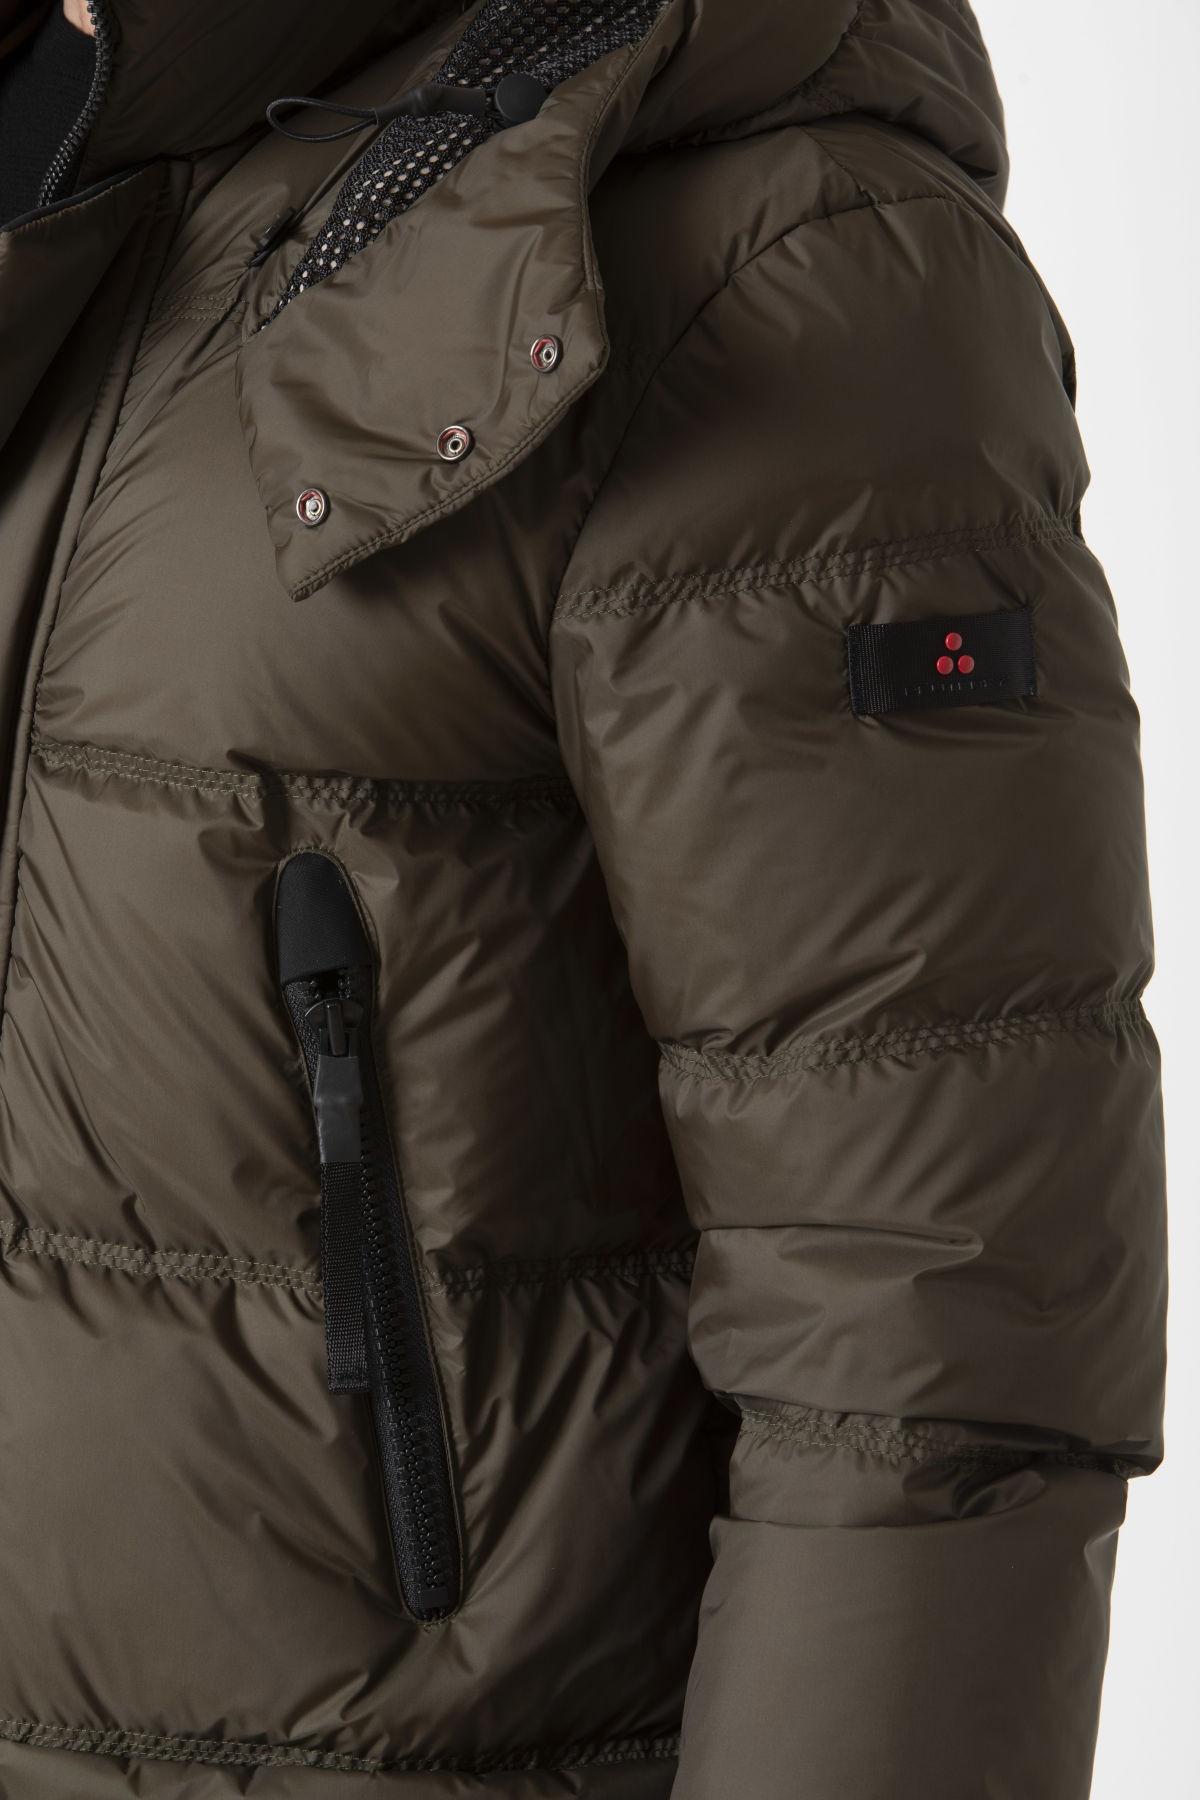 TVEIT Jacket for man PEUTEREY F/W 19-20